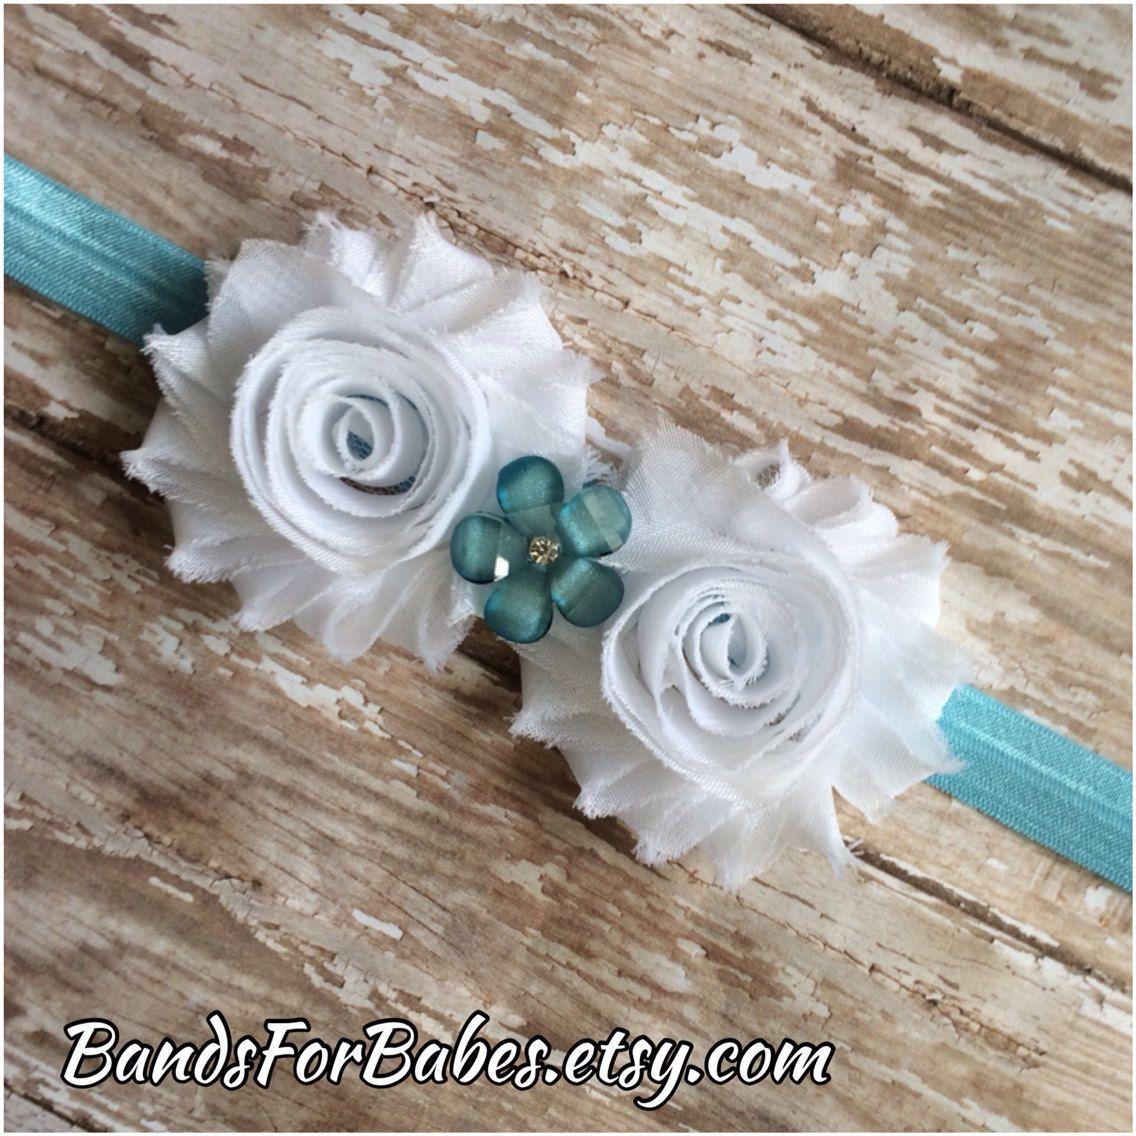 Items similar to Baby Blue and White Shabby Chic Flower Headband, Baby Headband, Toddler Headband, Girls Headband, Photo Prop on Etsy